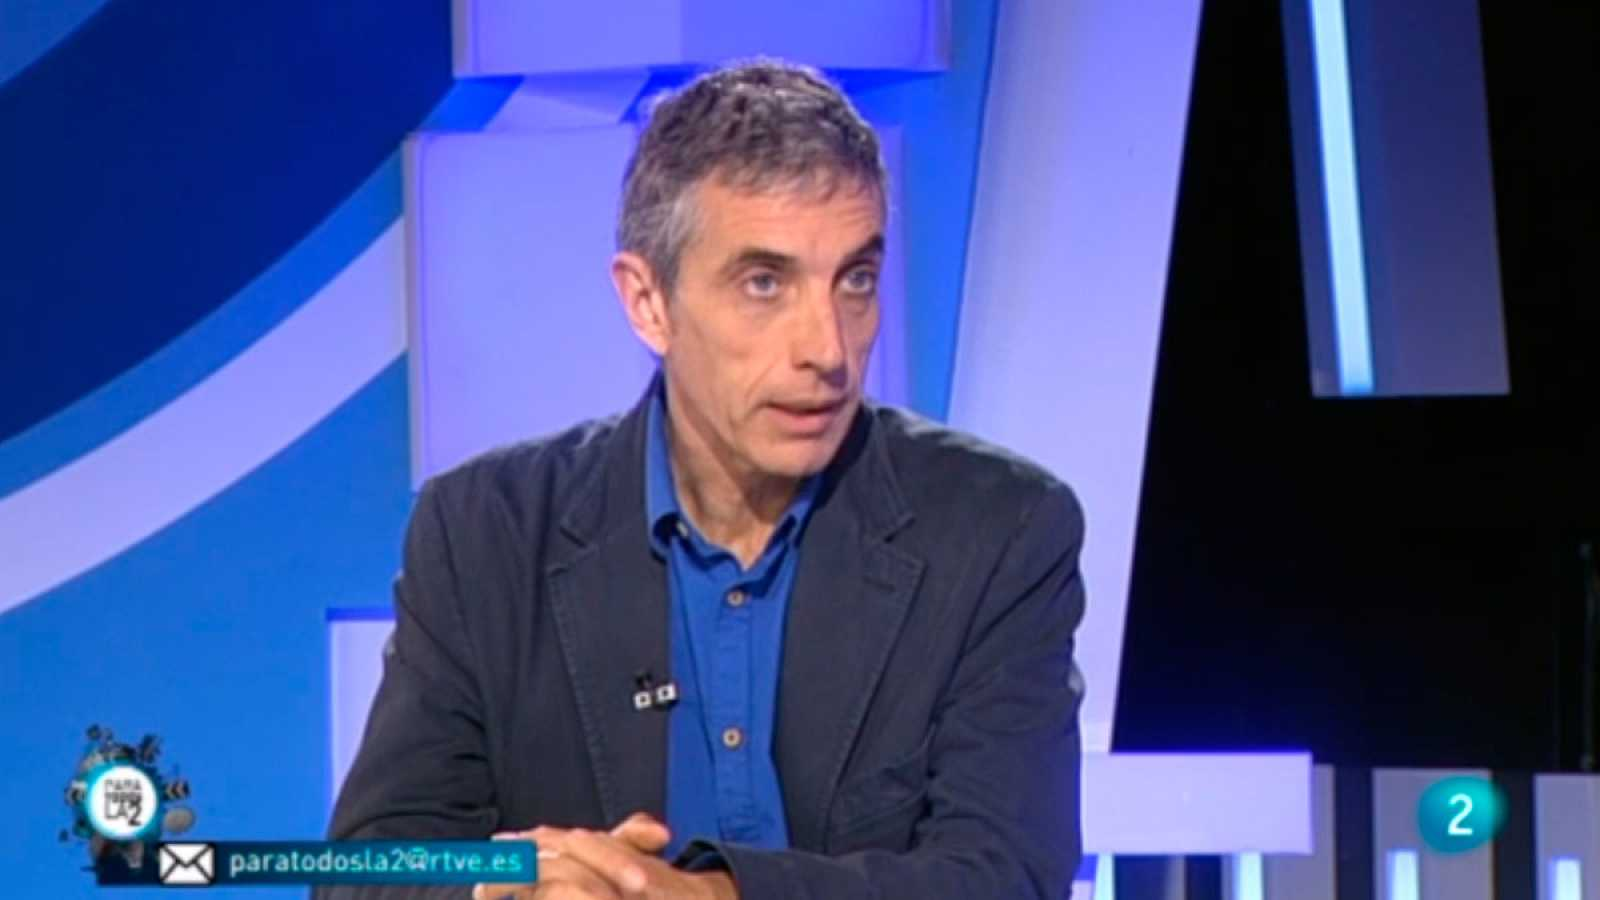 Para Todos La 2 - Entrevista al filósofo Jordi Pigem: ¿humanos o máquinas?